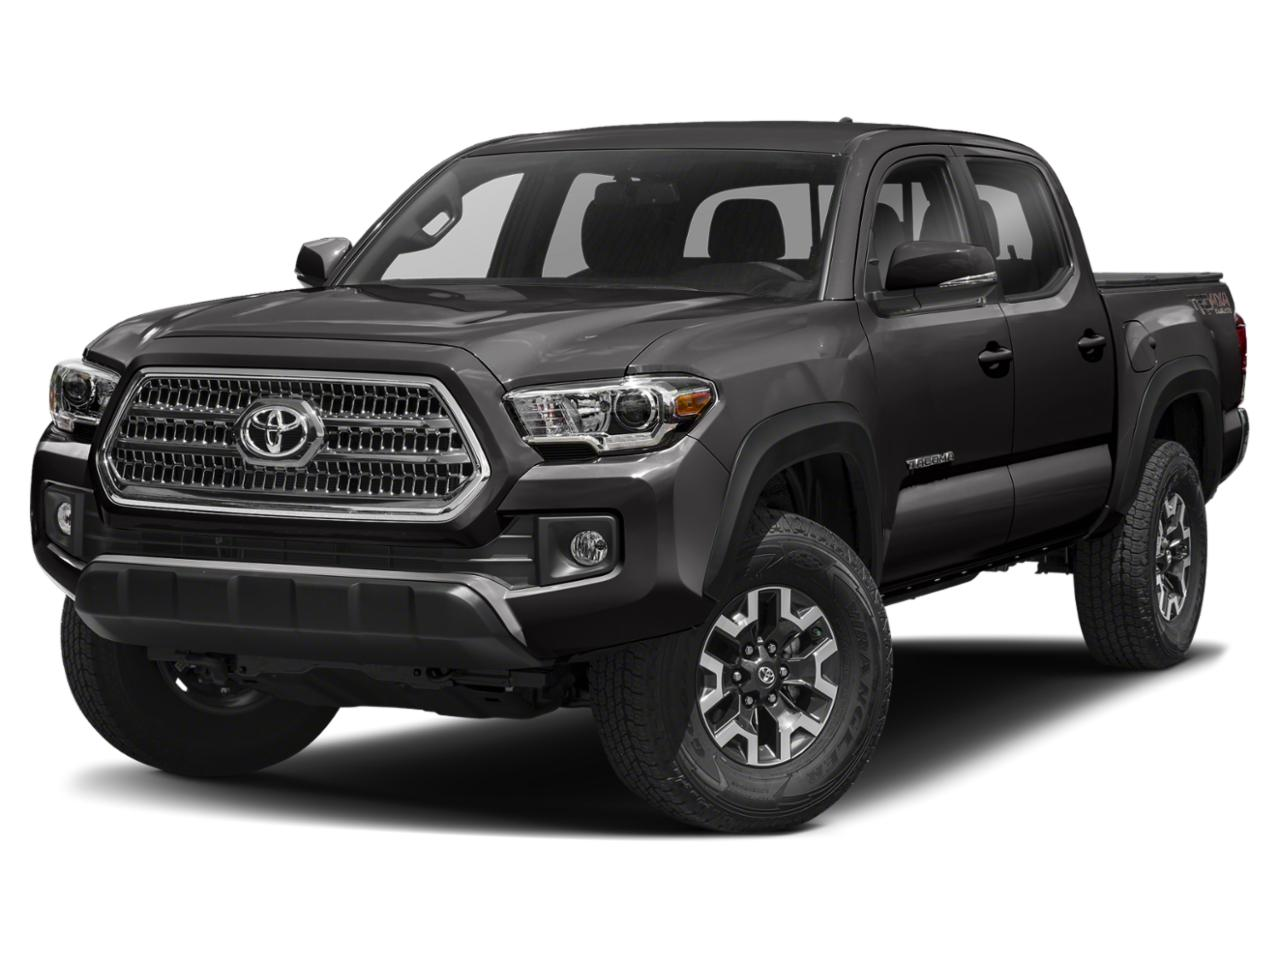 2018 Toyota Tacoma Vehicle Photo in Owensboro, KY 42303